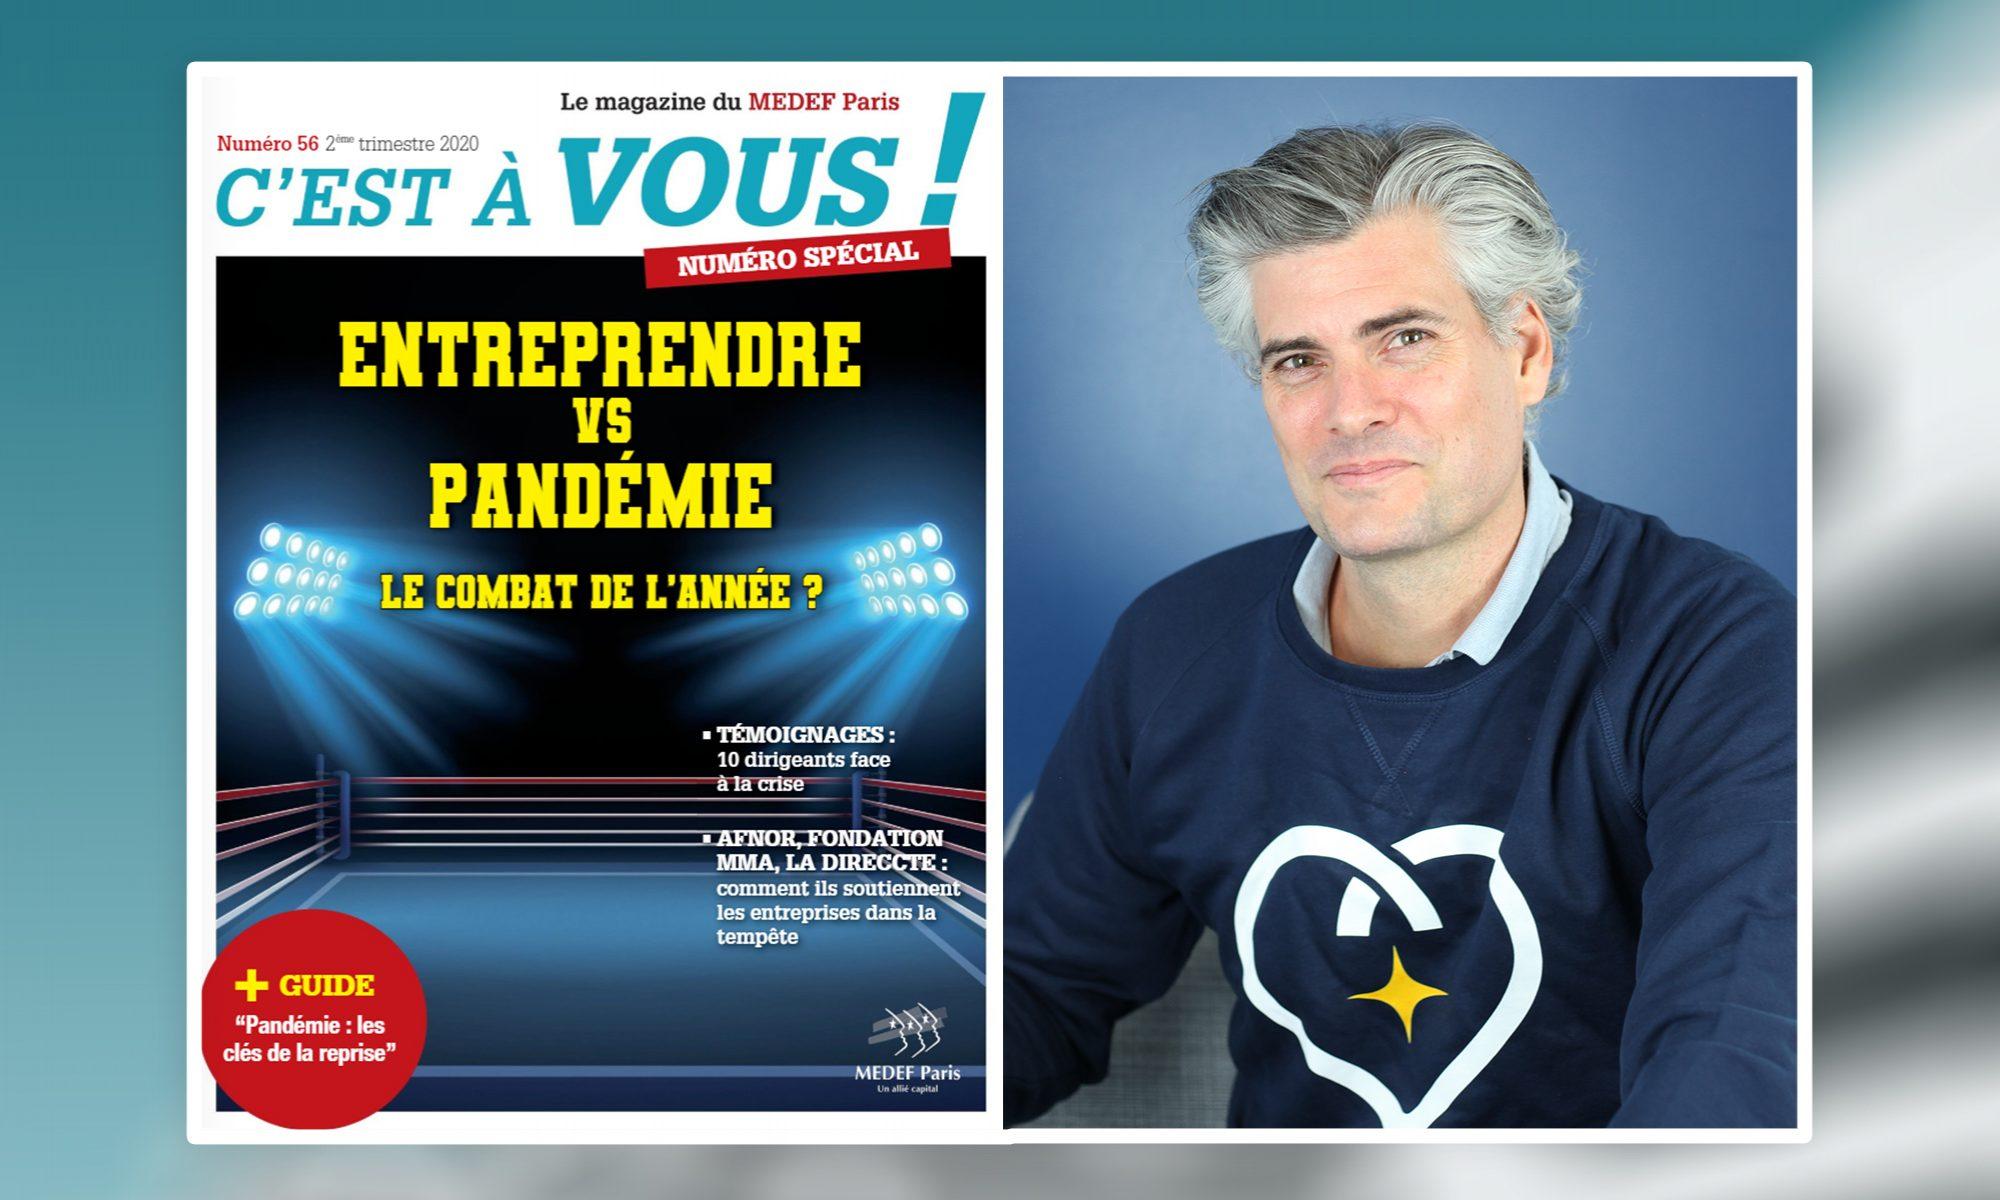 Interview de Florian Reinaud - Concilio - Confinement - Covid-19 - FR MEDEF PARIS MAGAZINE